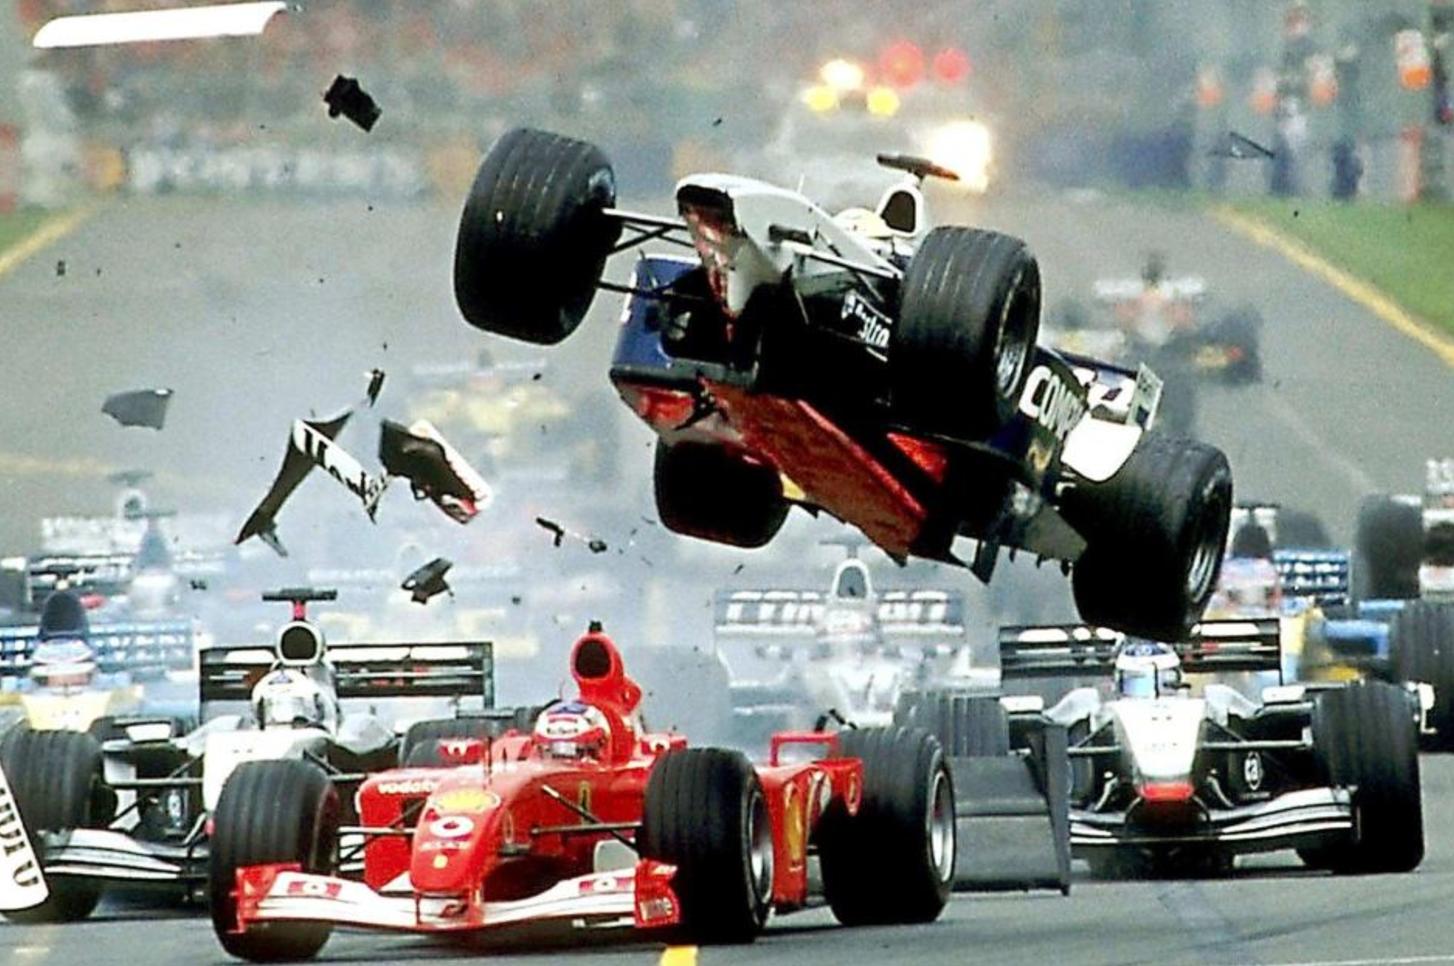 Ralph Schumacher air borne corner 1, lap 1. Melbourne F1 - 2002.